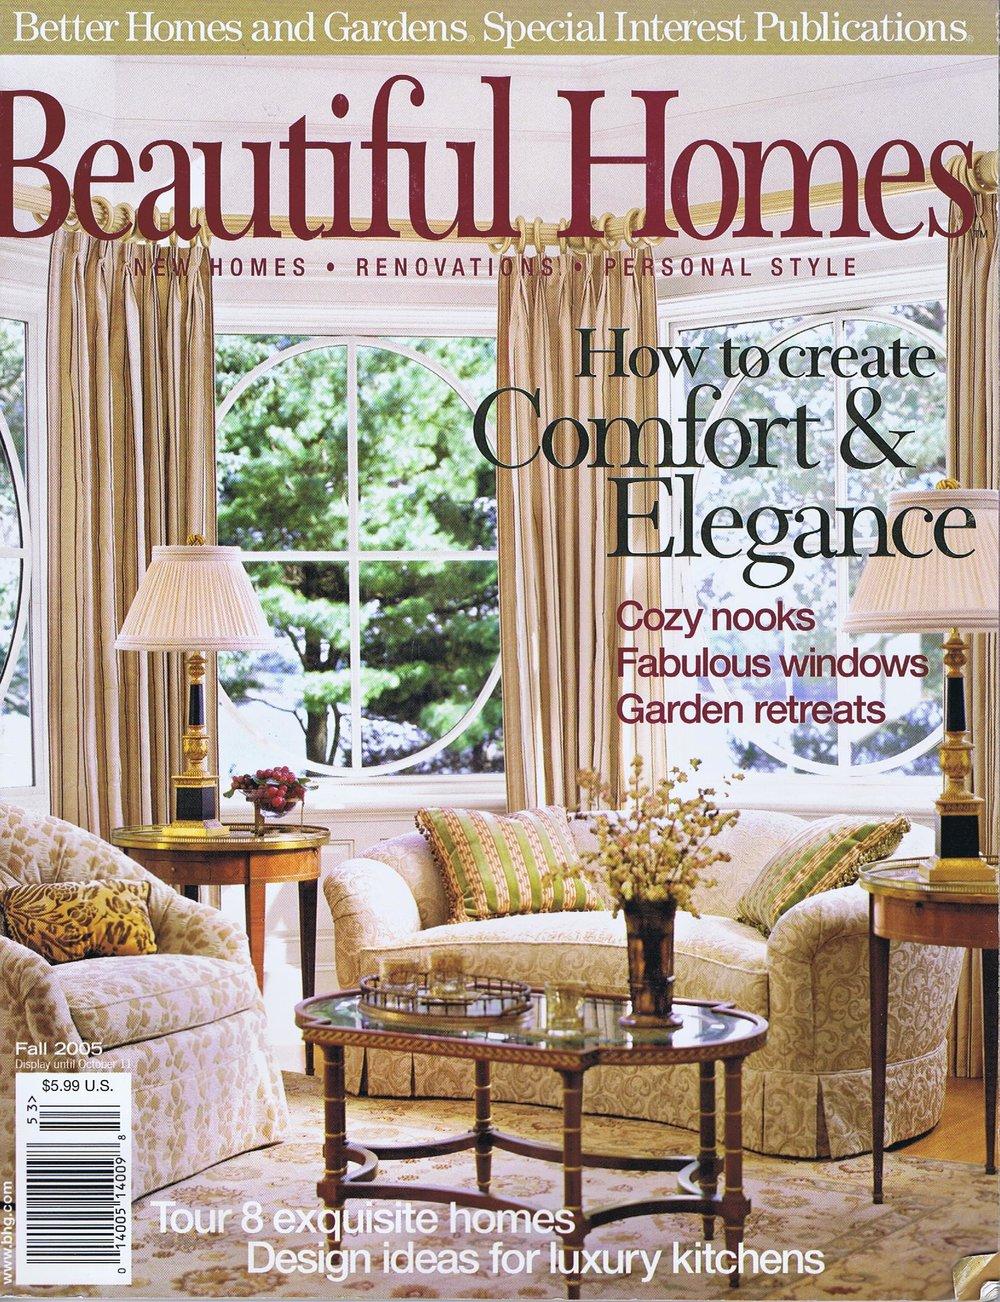 Beautiful Homes, Fall 2005